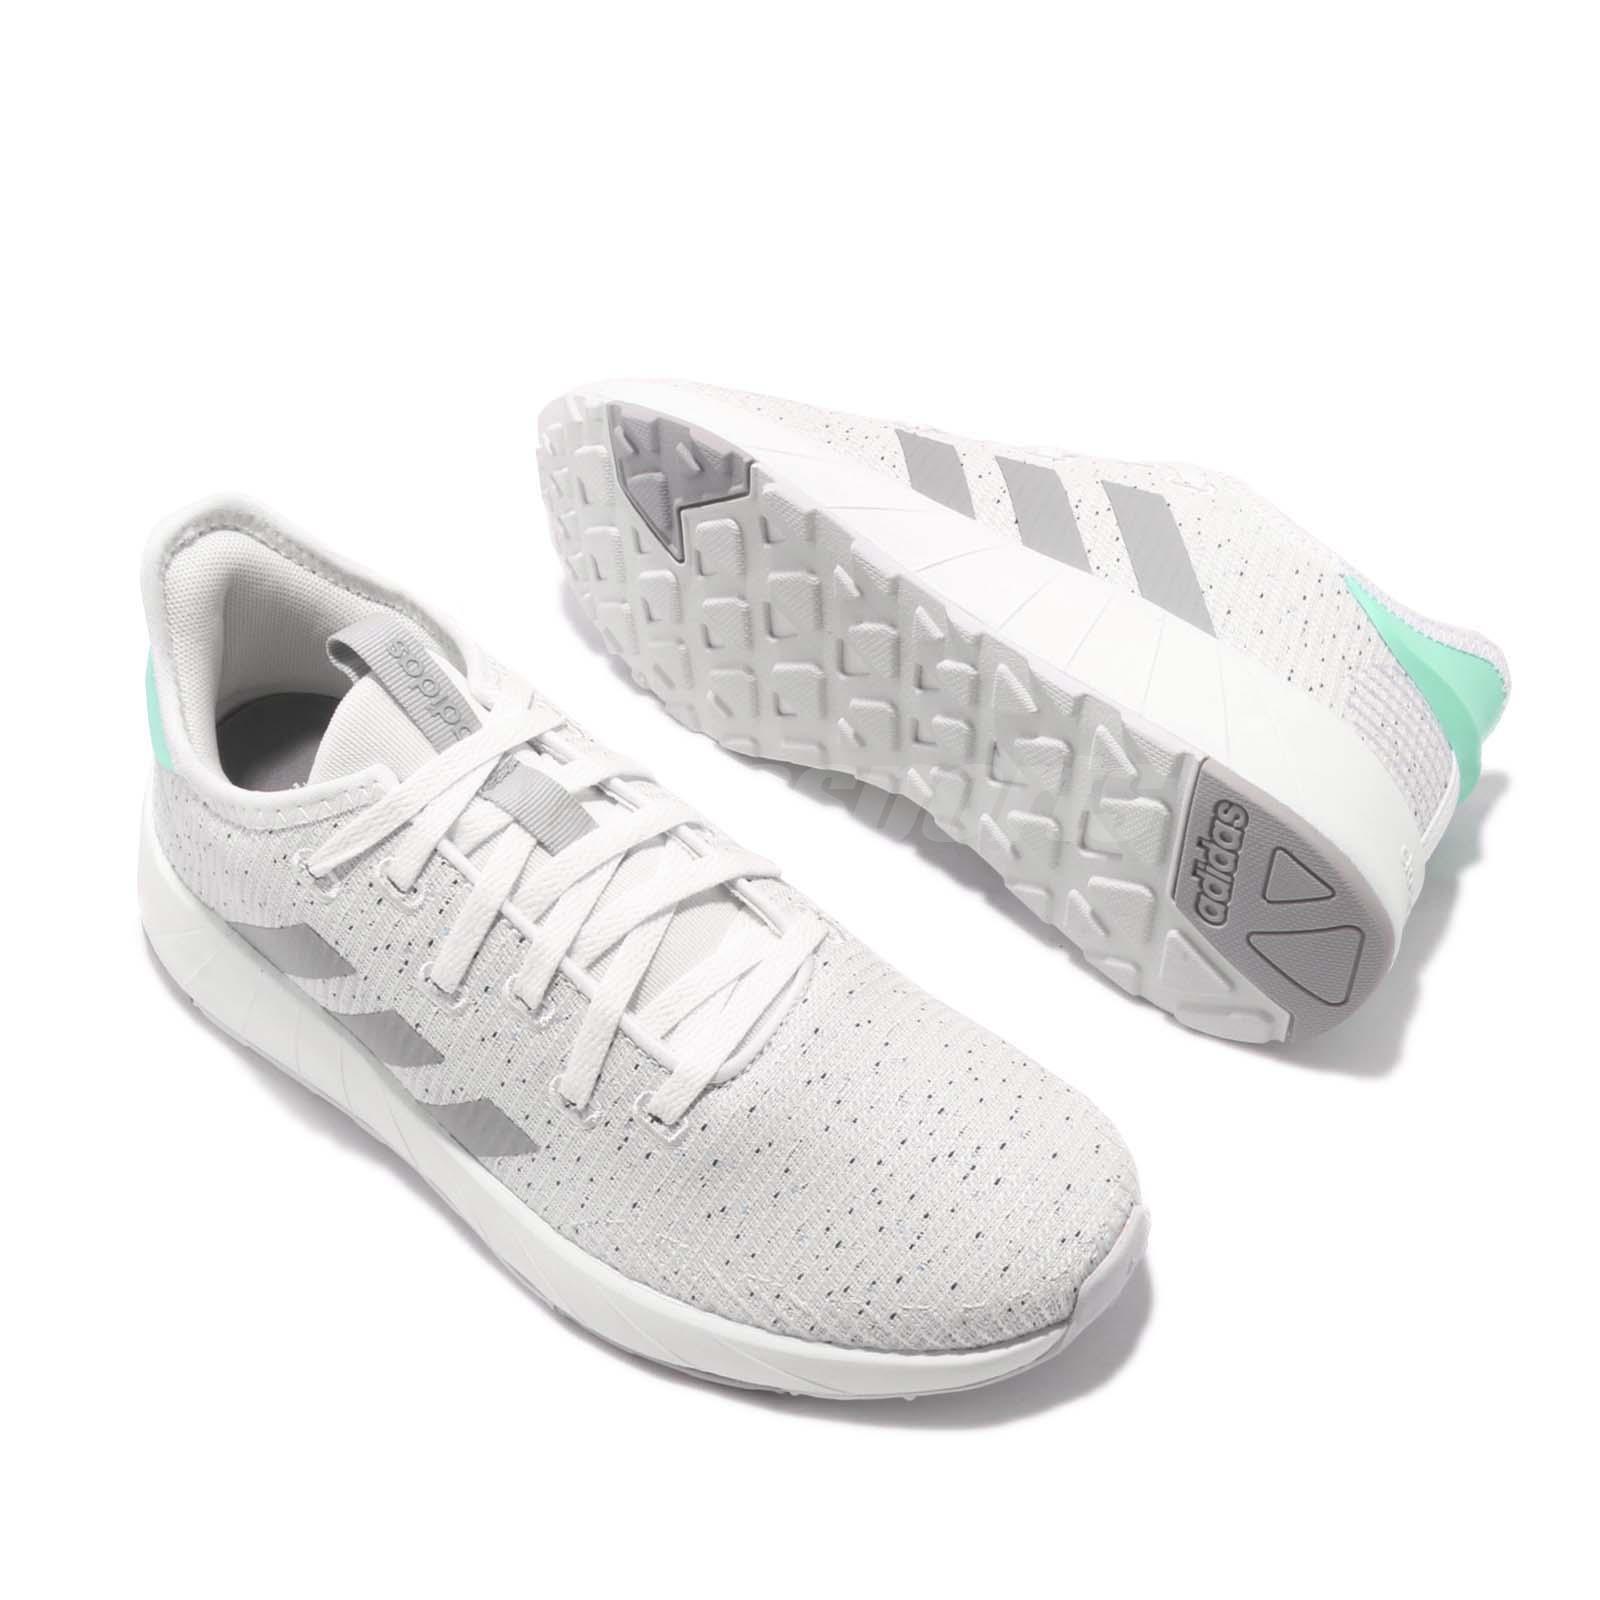 0e981b8099c9 adidas Questar X BYD White Grey Ice Mint Women Running Shoes ...